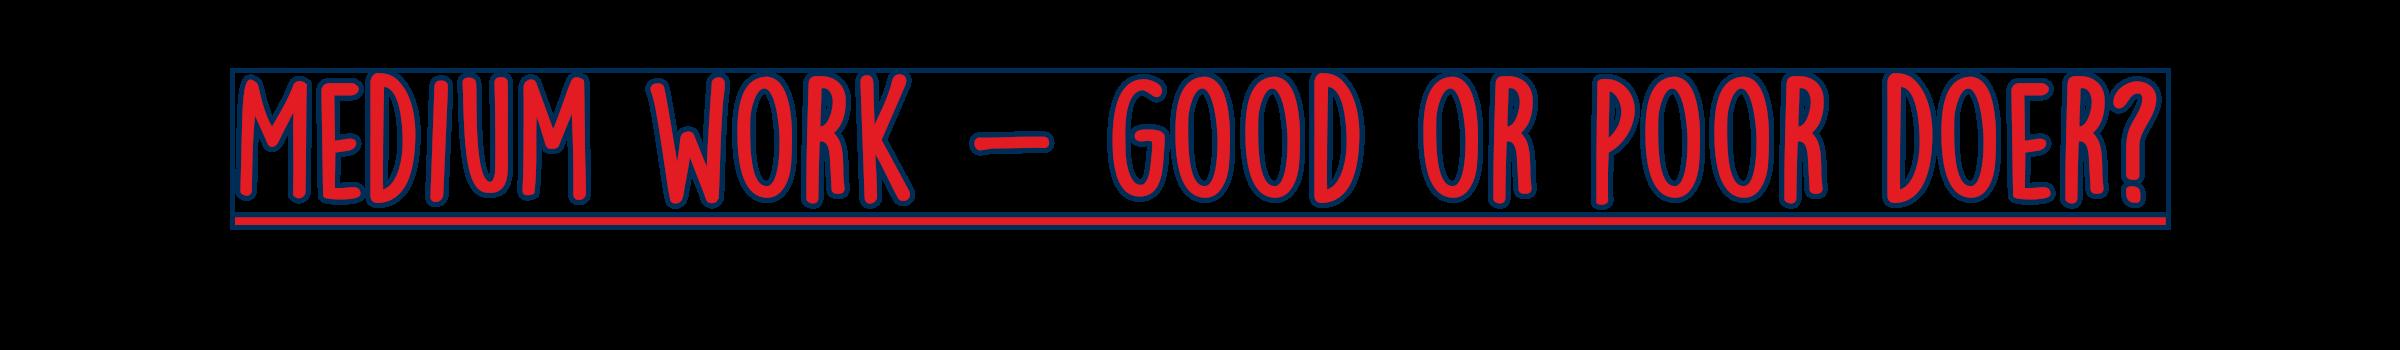 medium-work-good-or-bad-doer-2.png